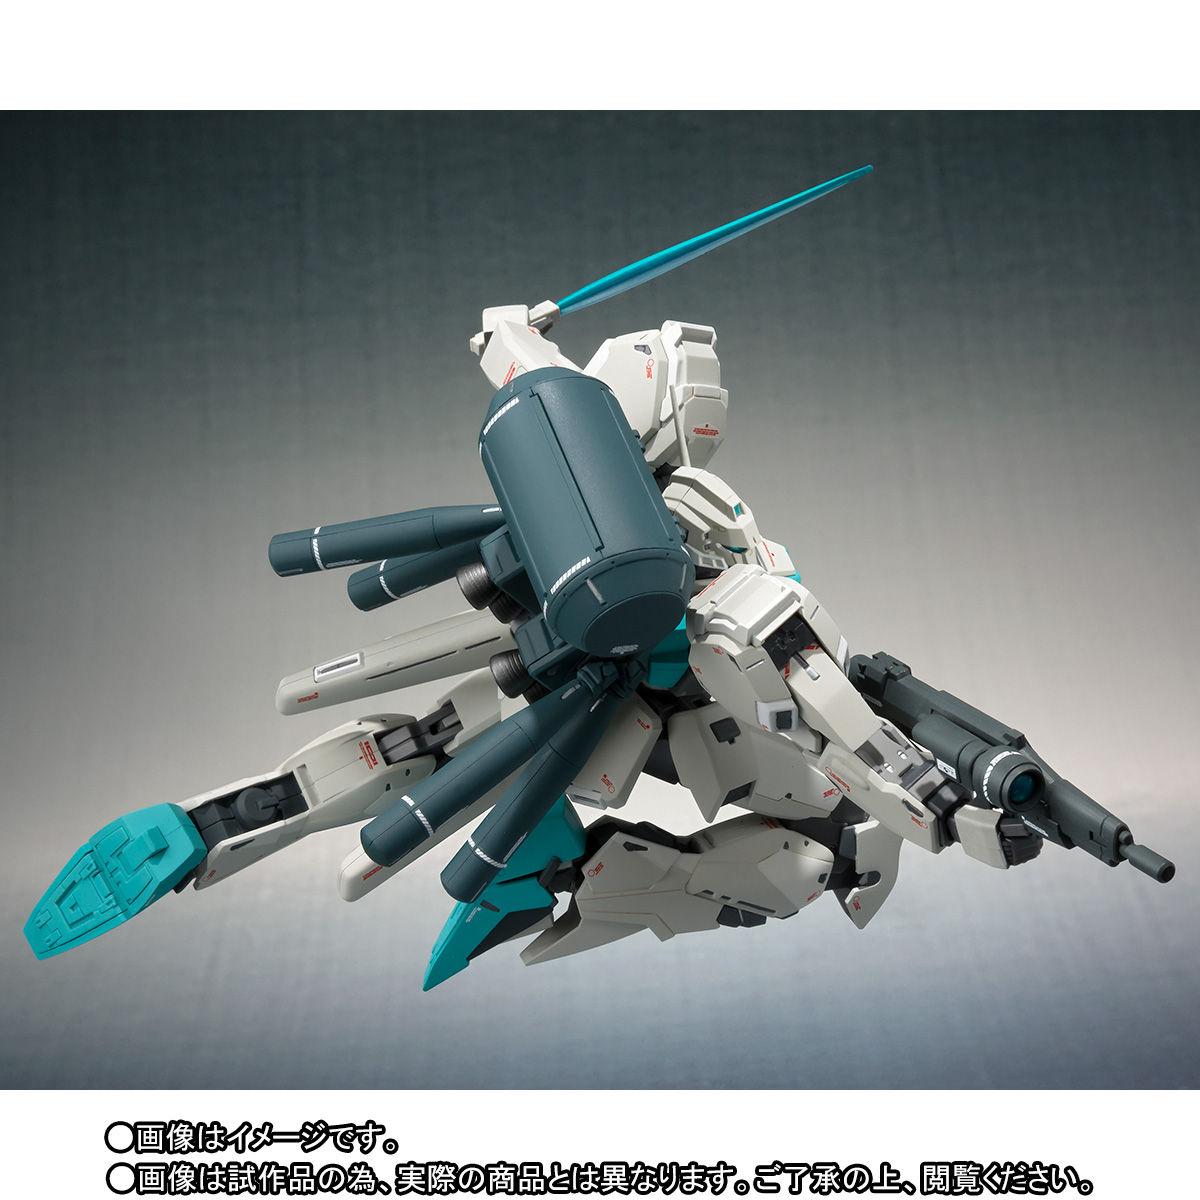 ROBOT魂(Ka signature)〈SIDE MS〉『ネロ(月面降下仕様)マーキングプラスVer.』ガンダム・センチネル 可動フィギュア-003